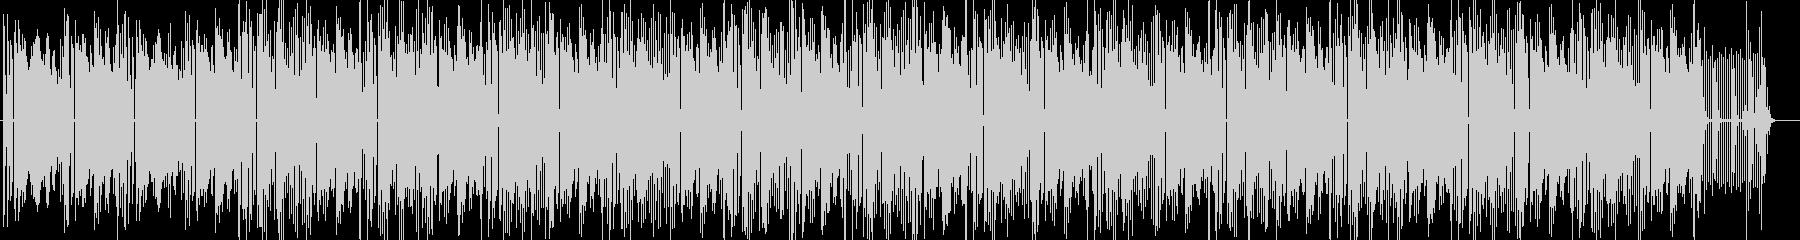 Lo-Fiな音色のHiphopの未再生の波形